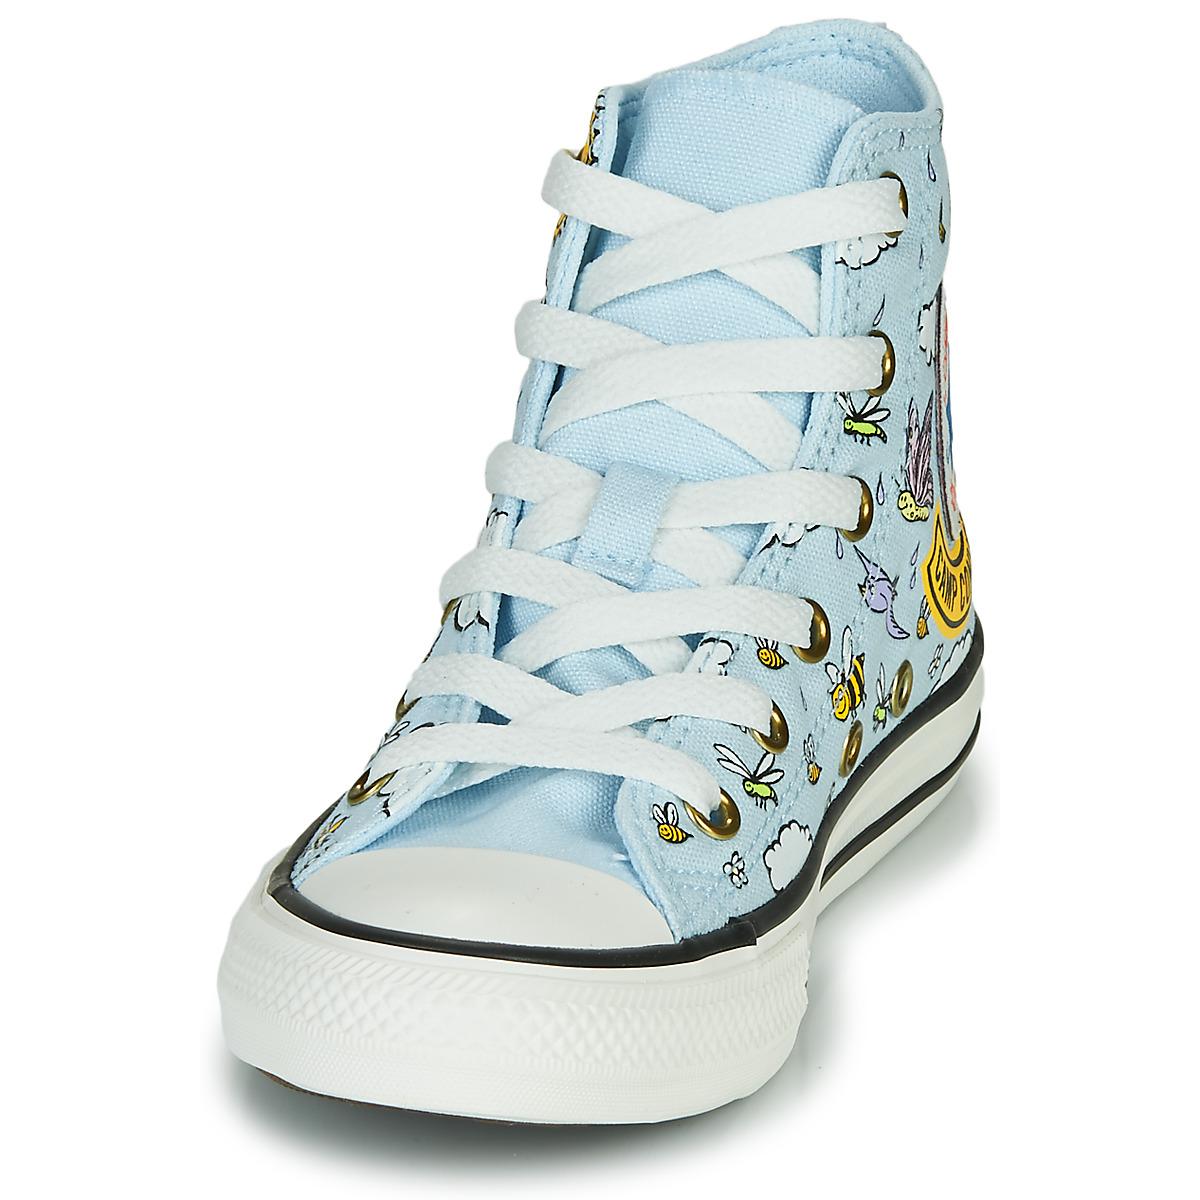 scarpe bimba converse invernali